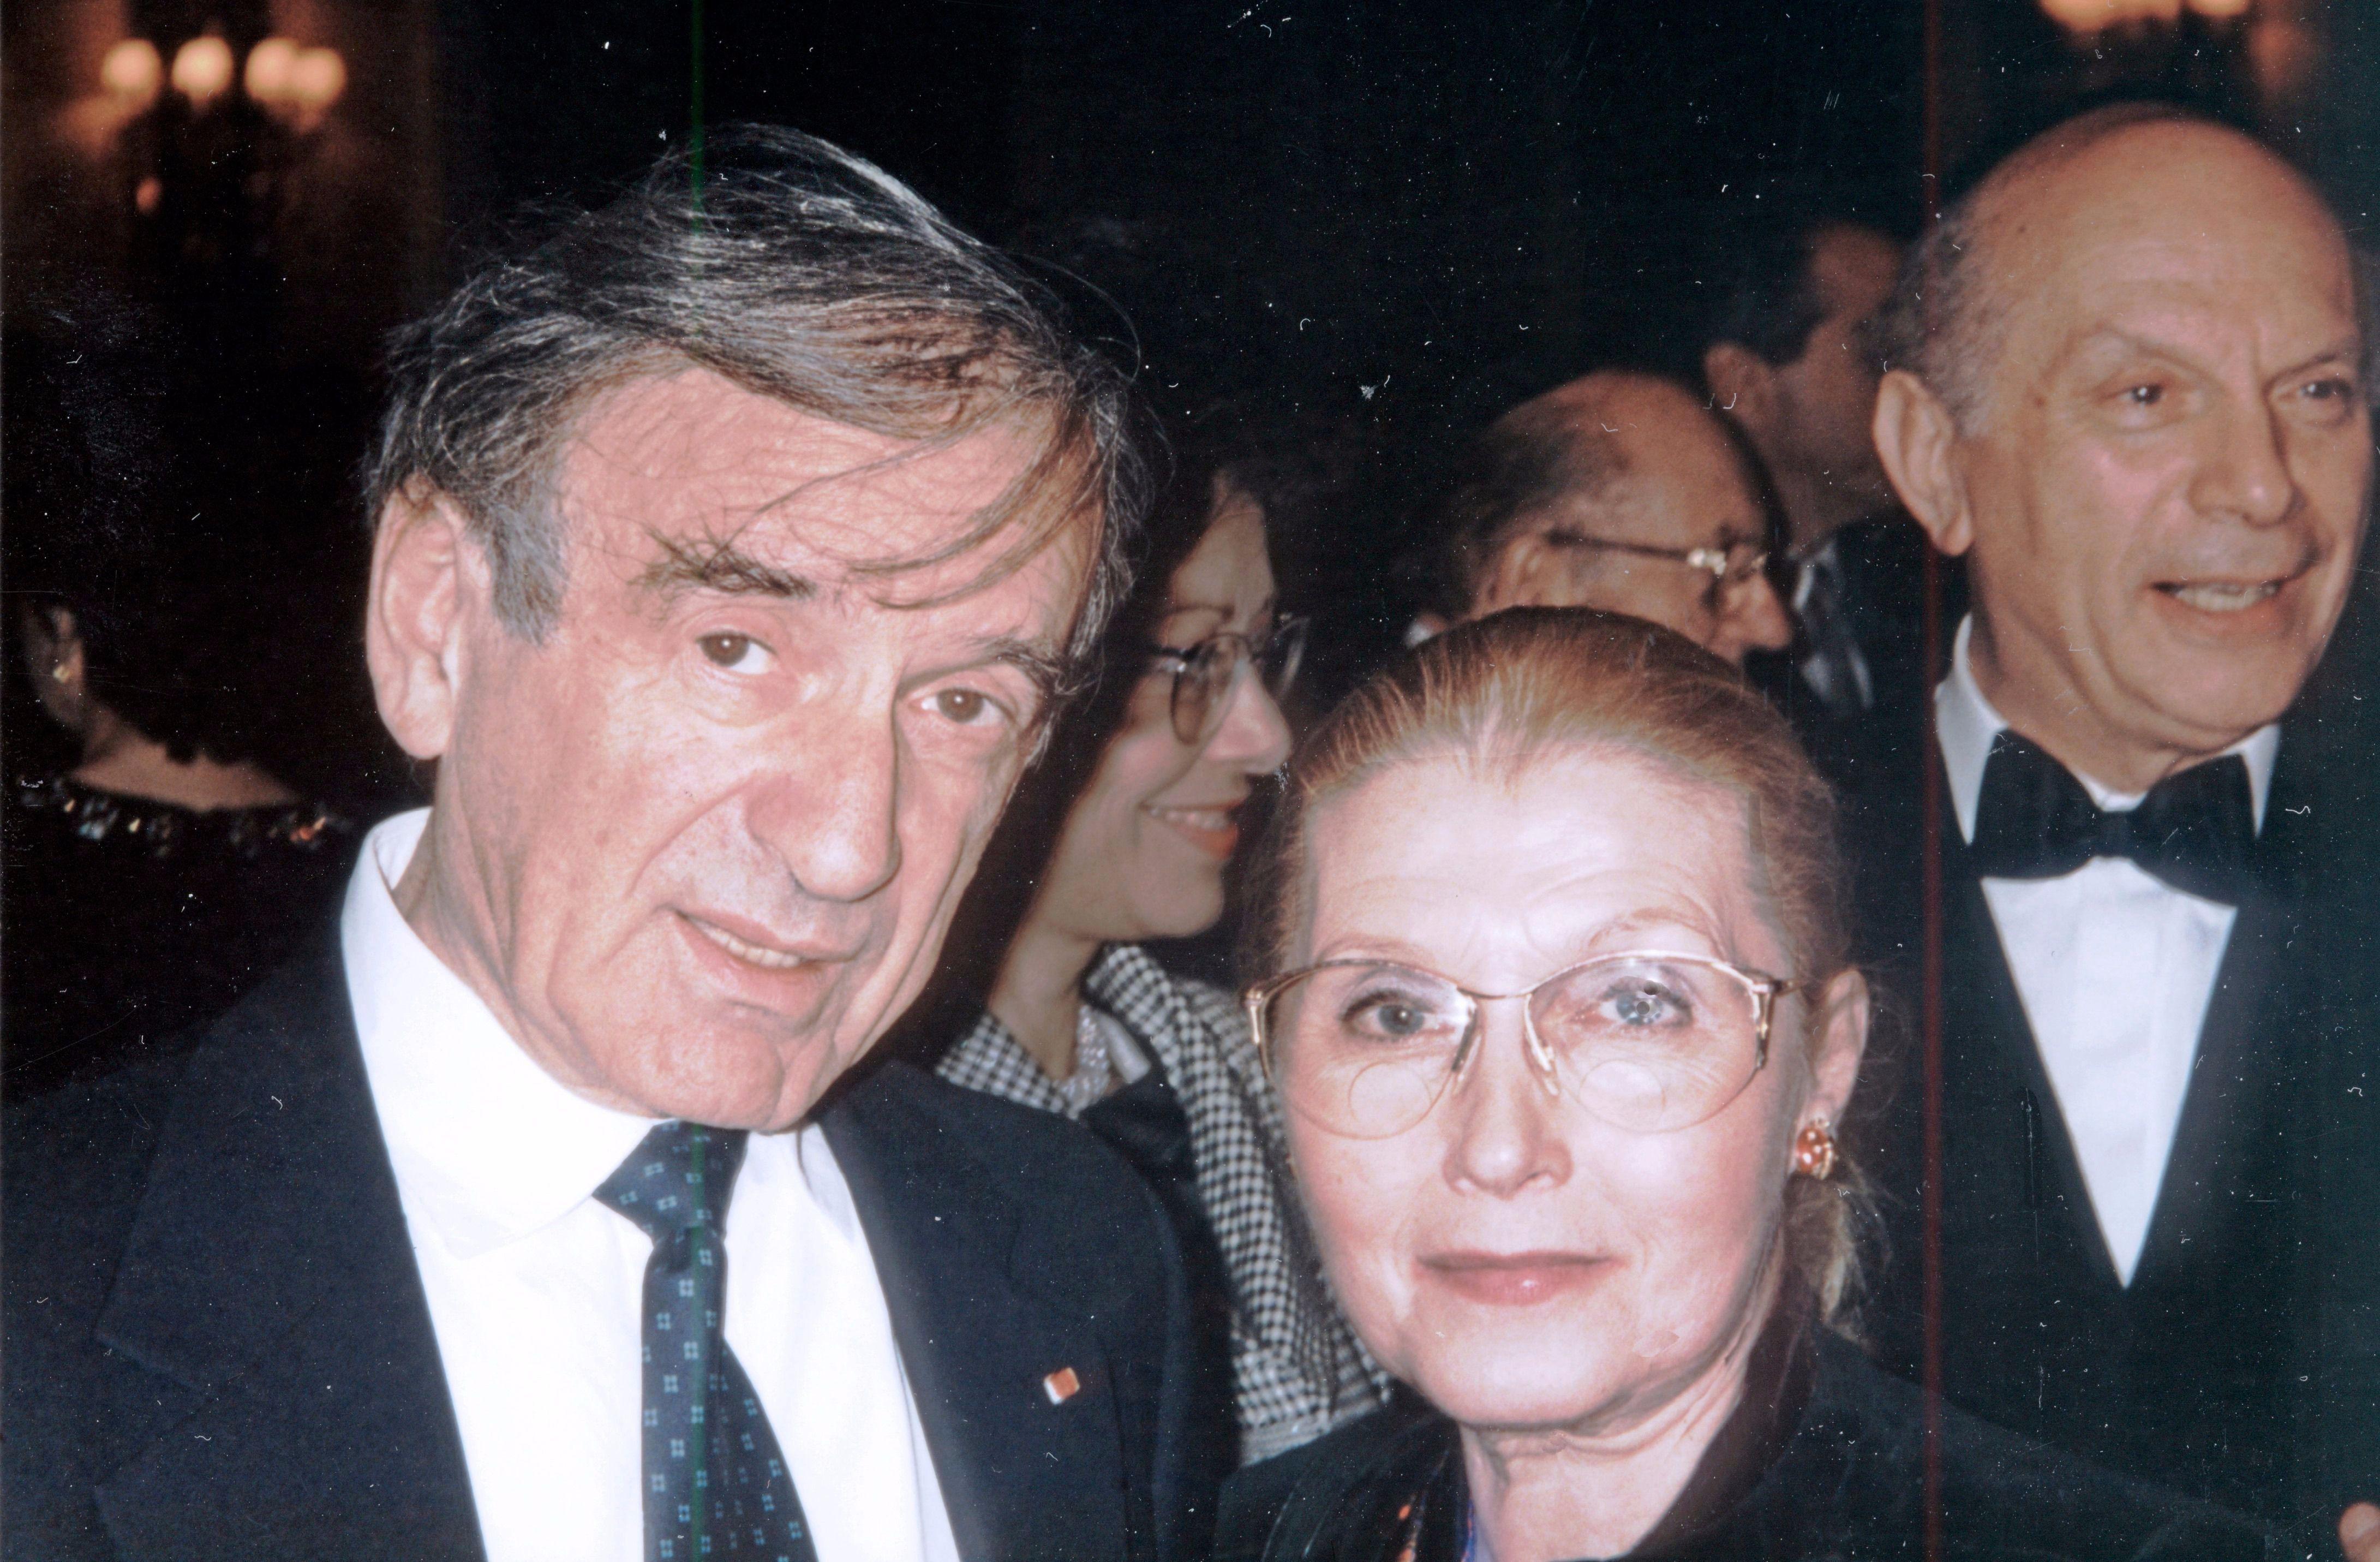 Leon with Elie Wiesel.